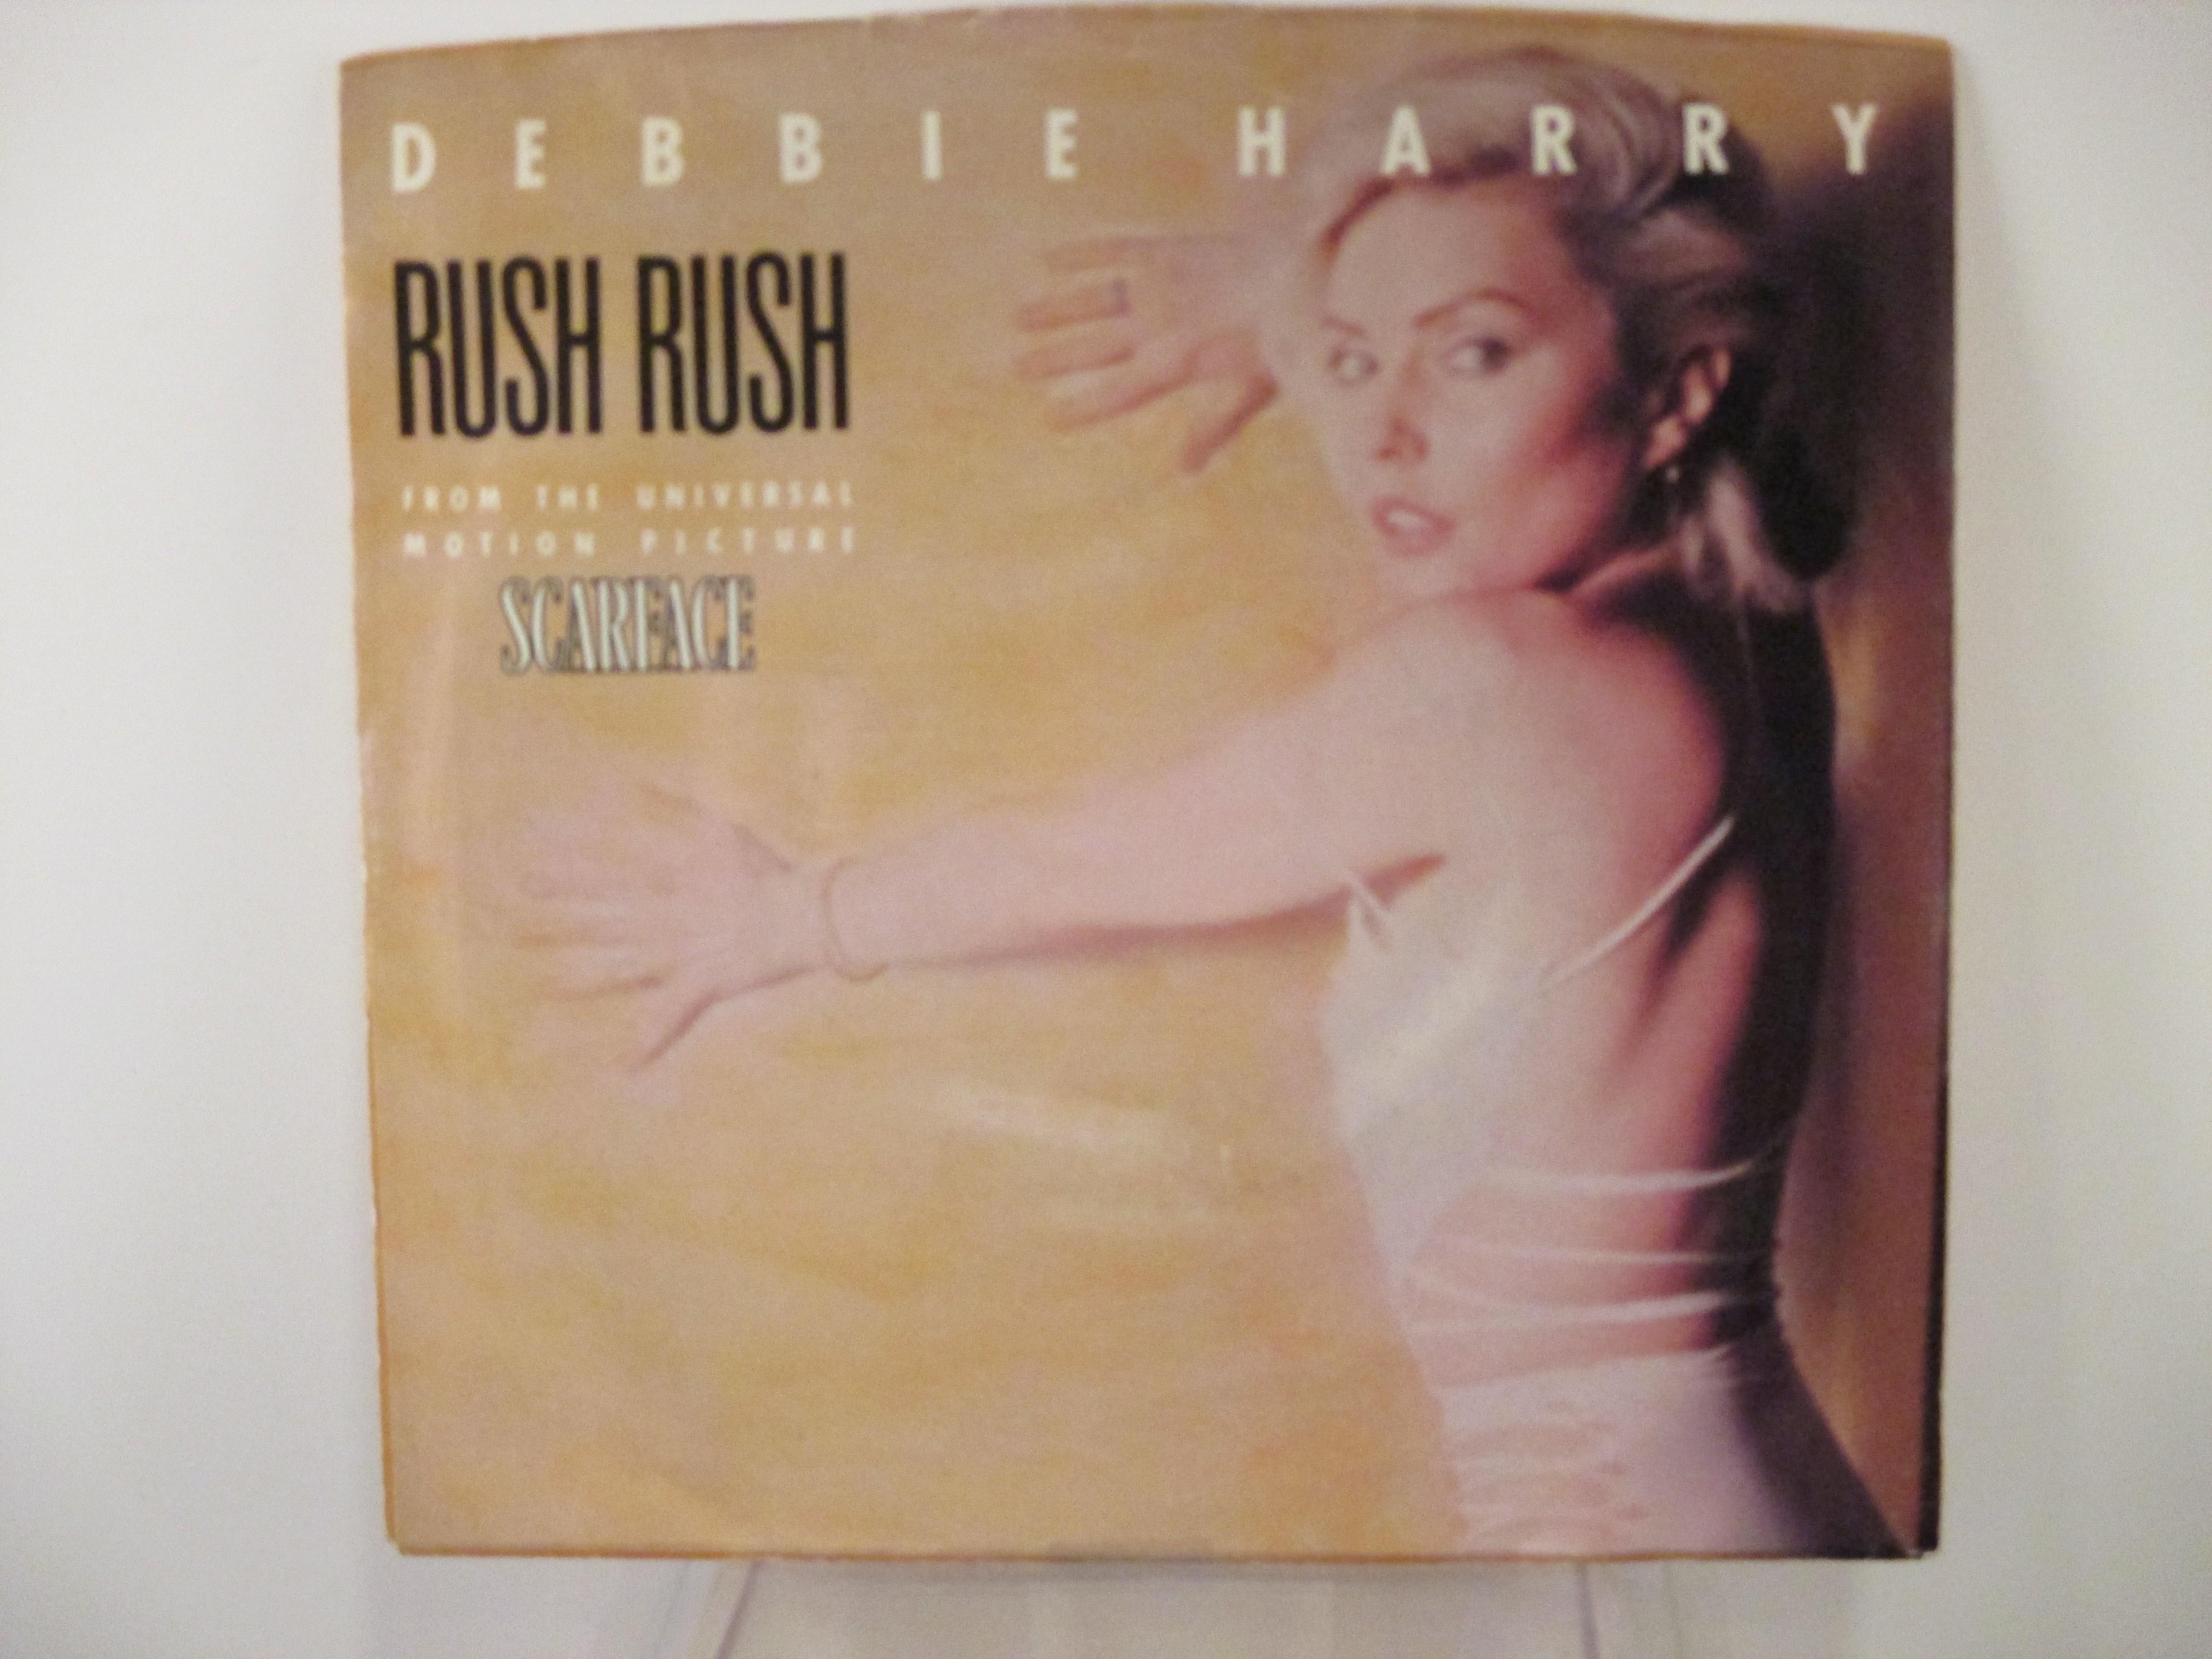 DEBBIE HARRY : Rush, rush / Dance, dance, dance